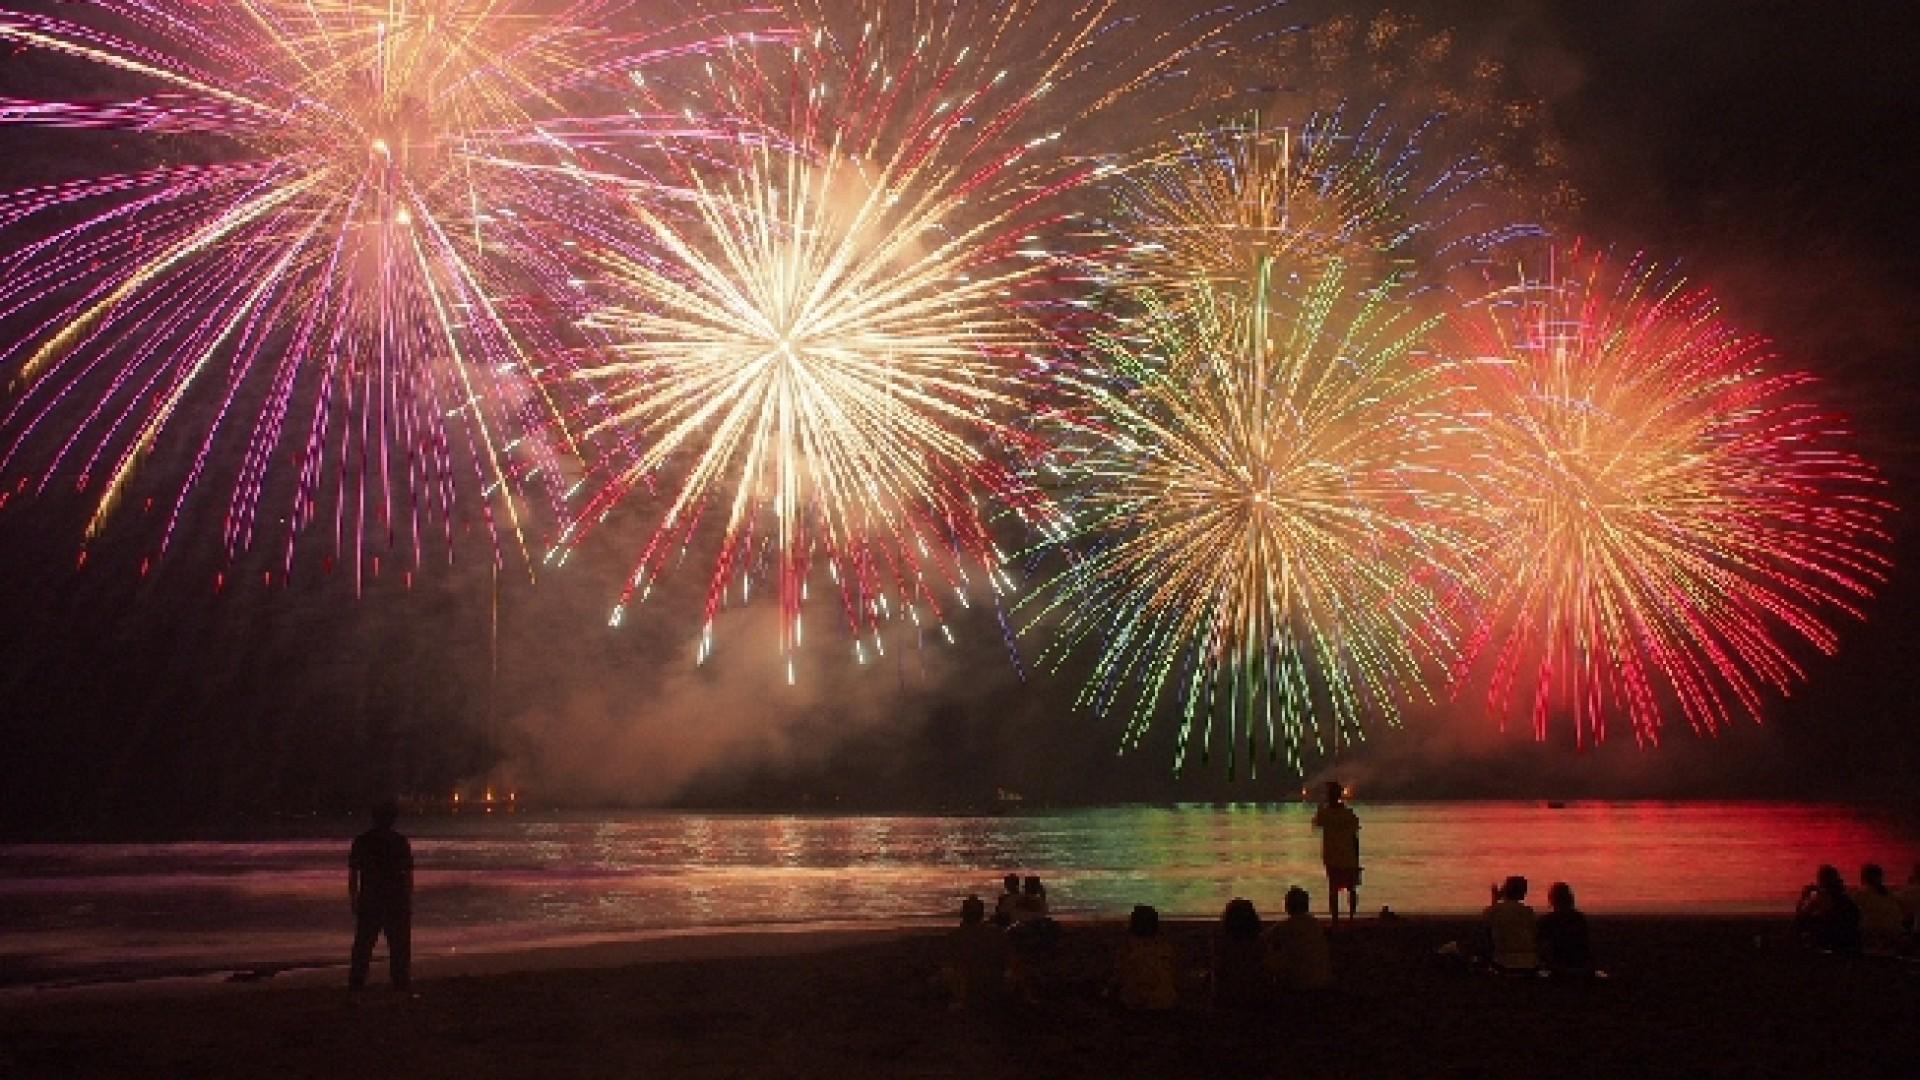 Festival de feux d'artifice maritimes de Yugawara Onsen